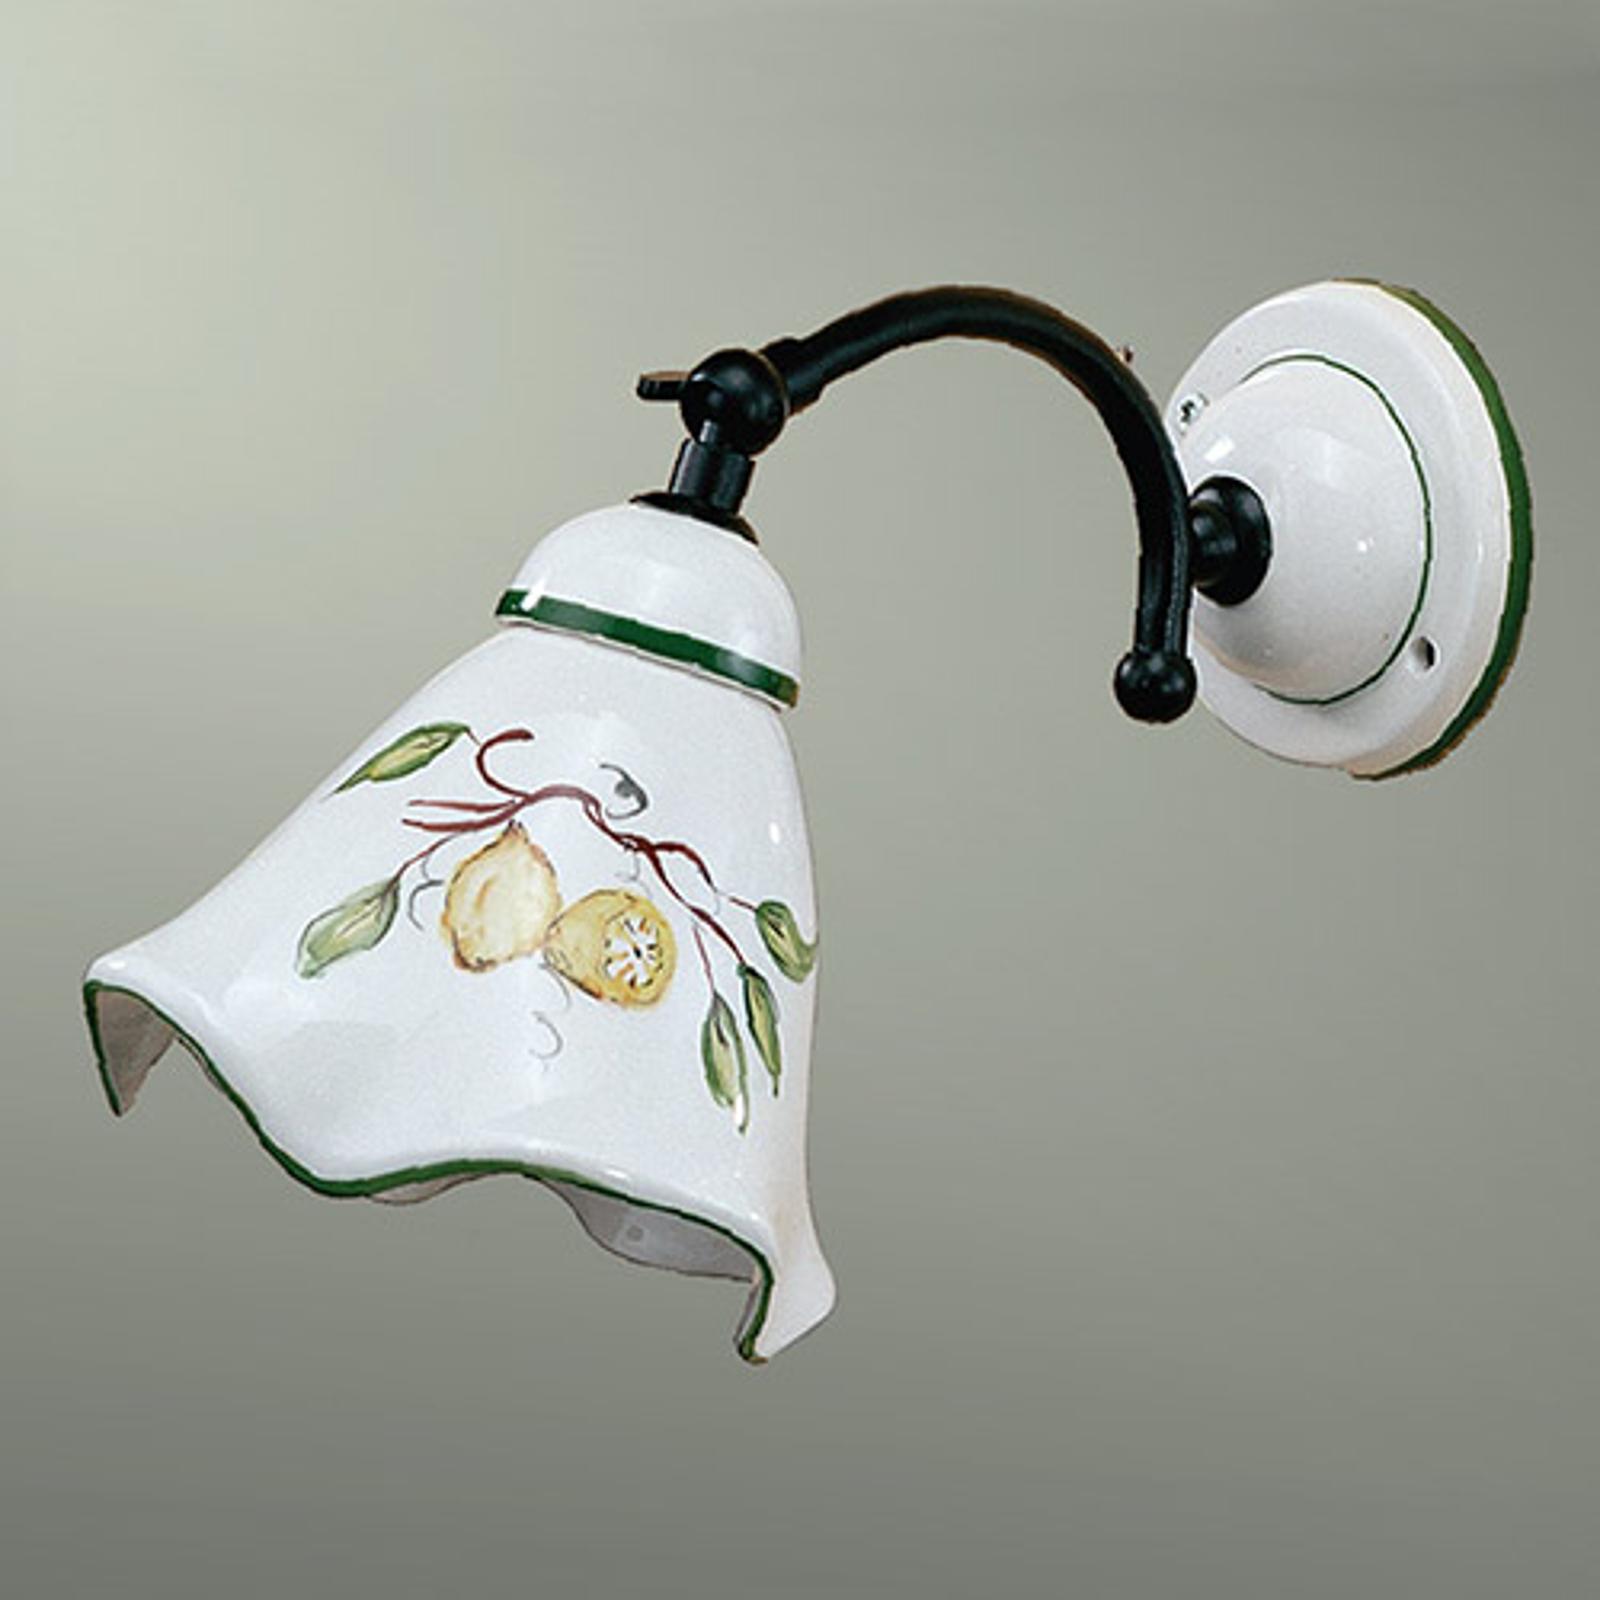 Ceramic wall light Felicia with lemon pattern_3046183_1